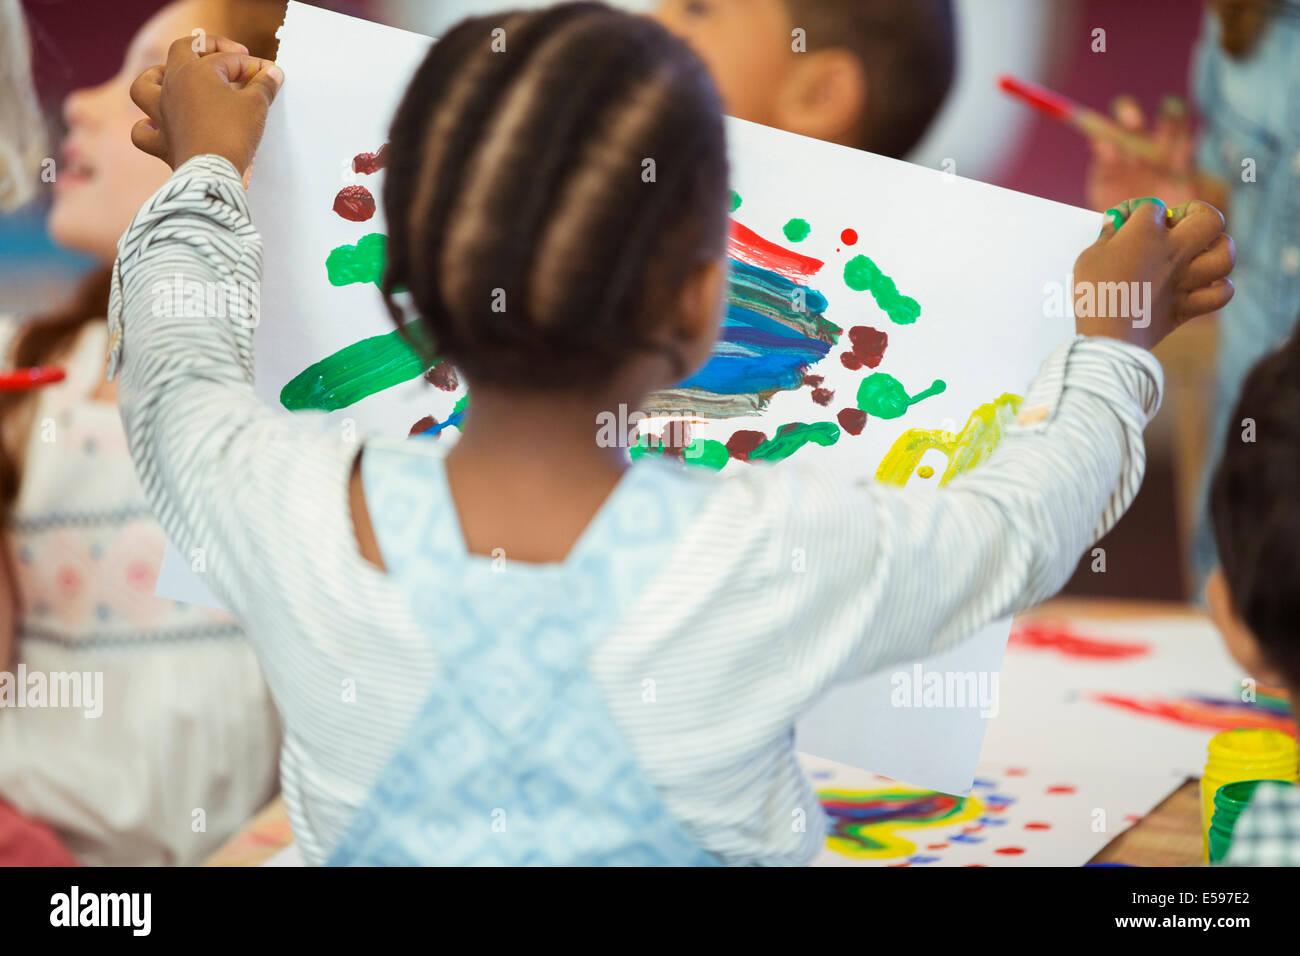 Schüler, die Malerei in der Klasse halten Stockbild